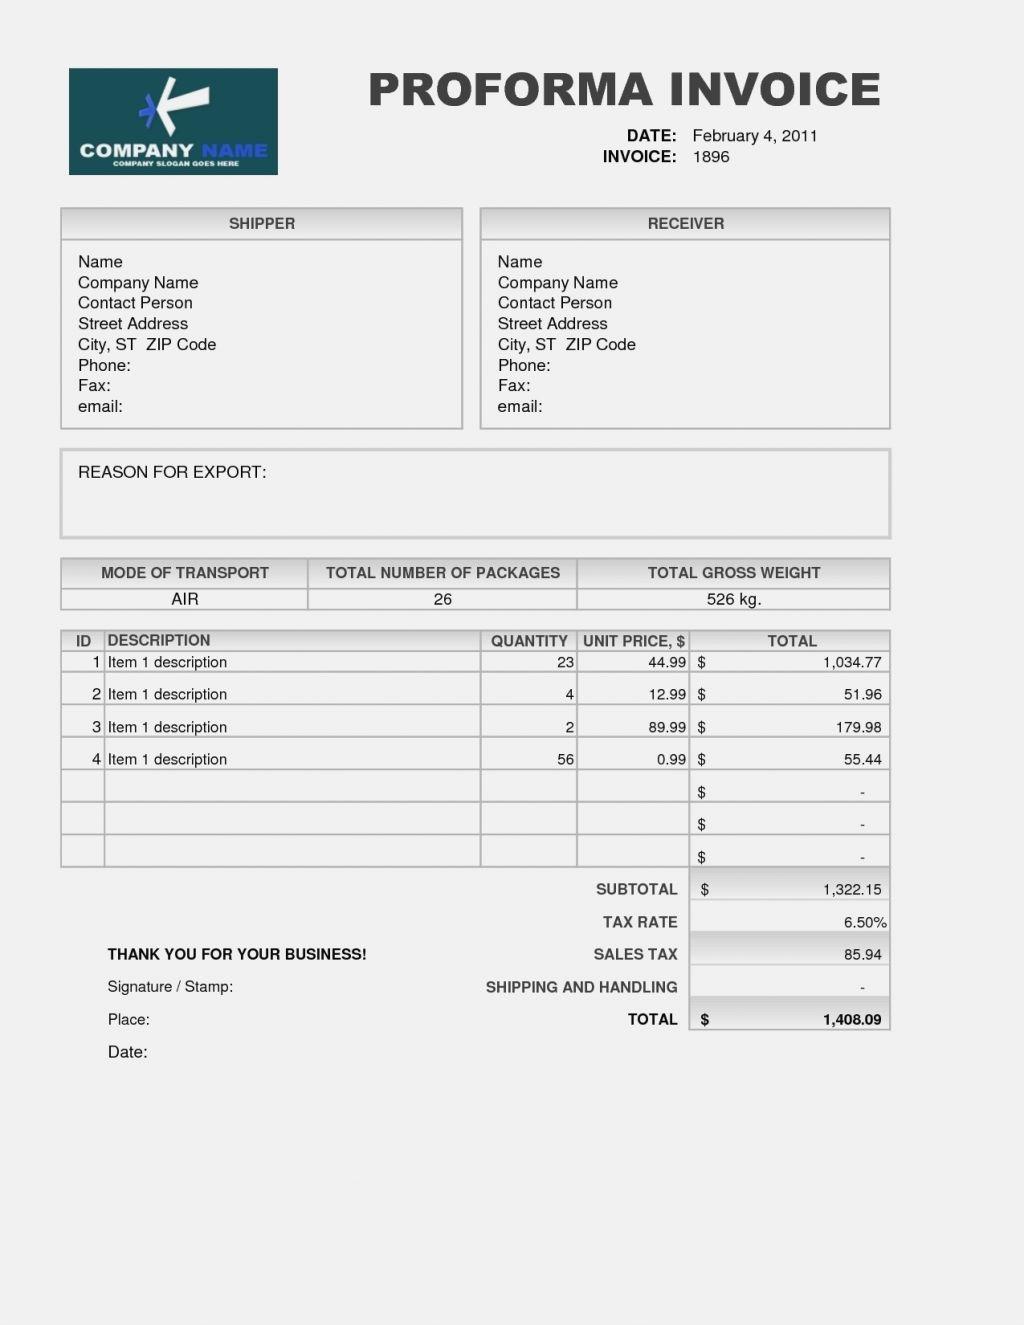 proforma invoice excel sample 5 signature signs of a winning sample proforma invoice excel template